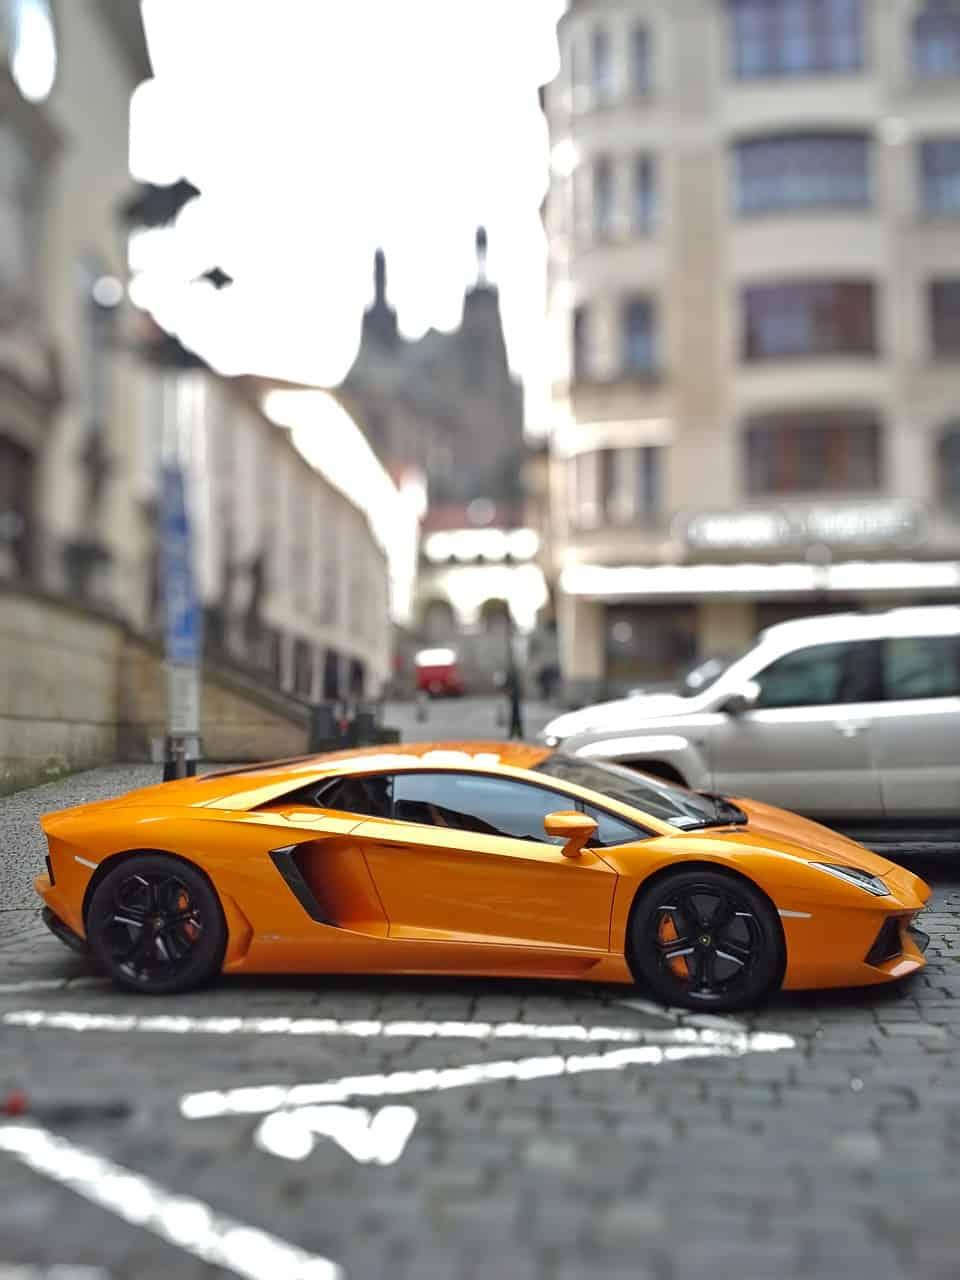 Luxury Car Rental Season Car And Chauffeur Hire - Cool cars rental